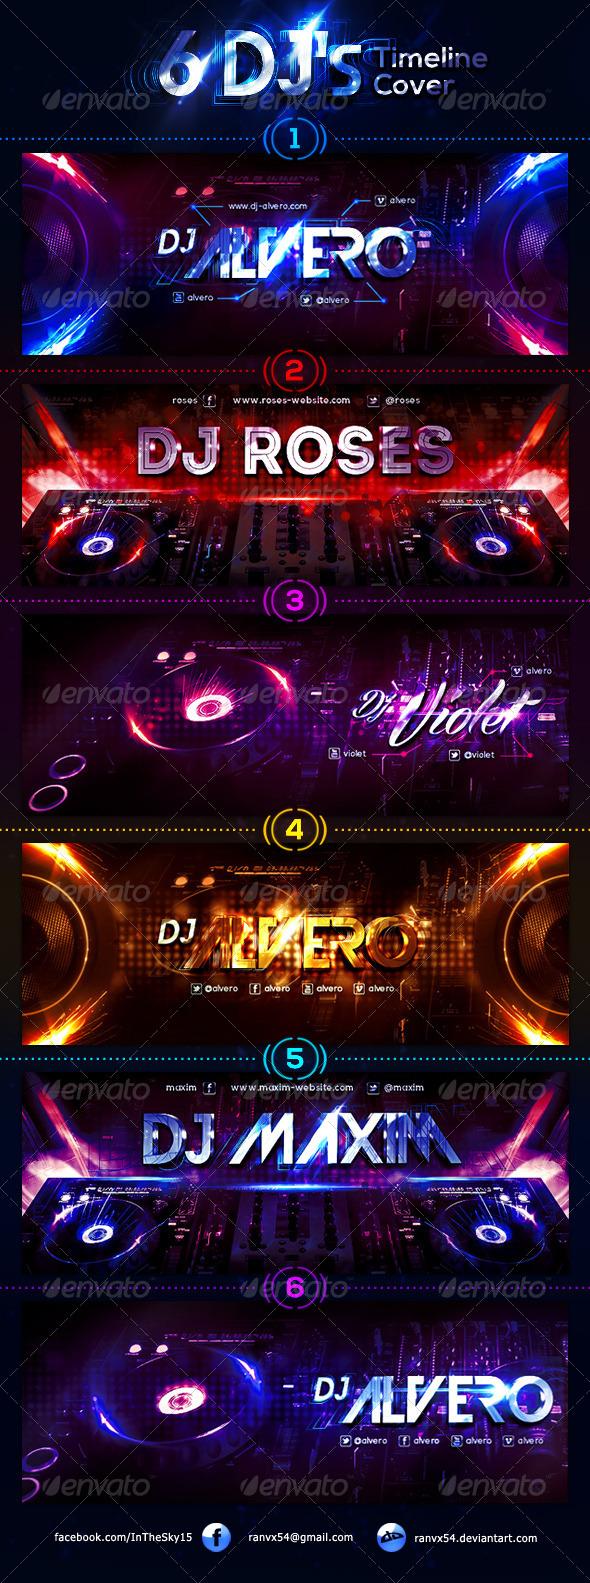 GraphicRiver 6 DJ s FB Timeline Cover 7701847